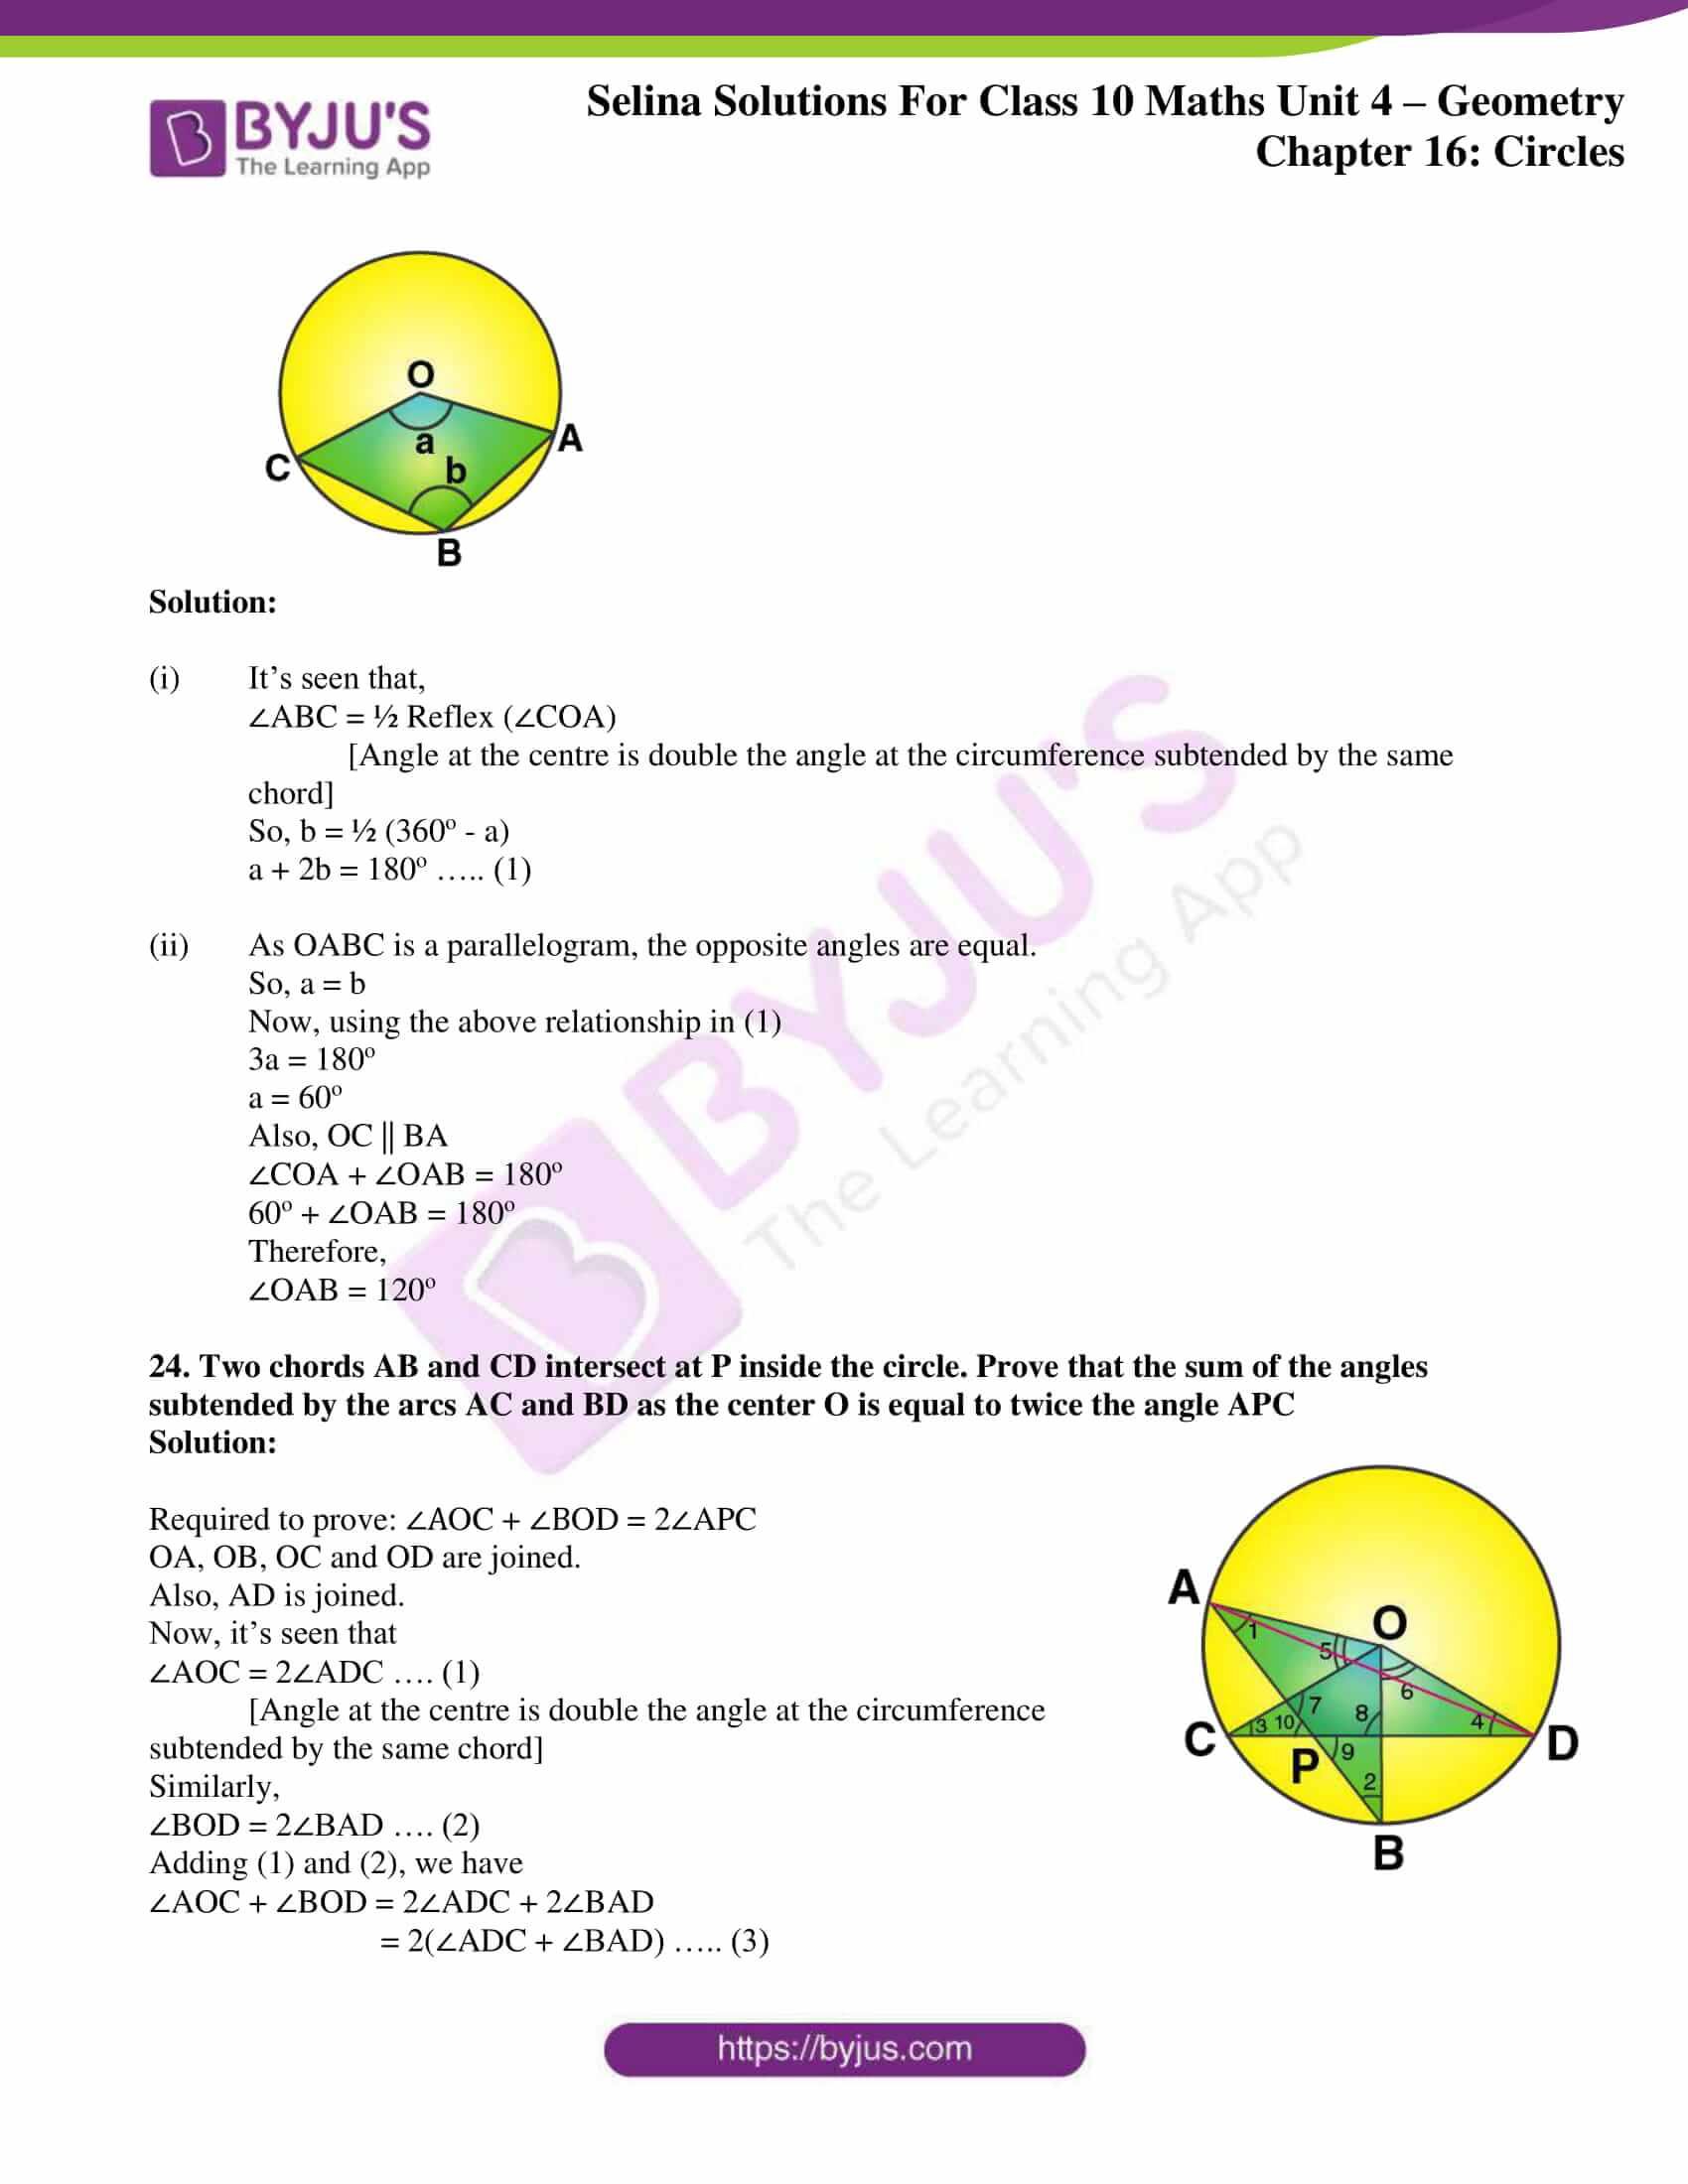 selina-sol-maths-class-10-ch-17-ex-a-13